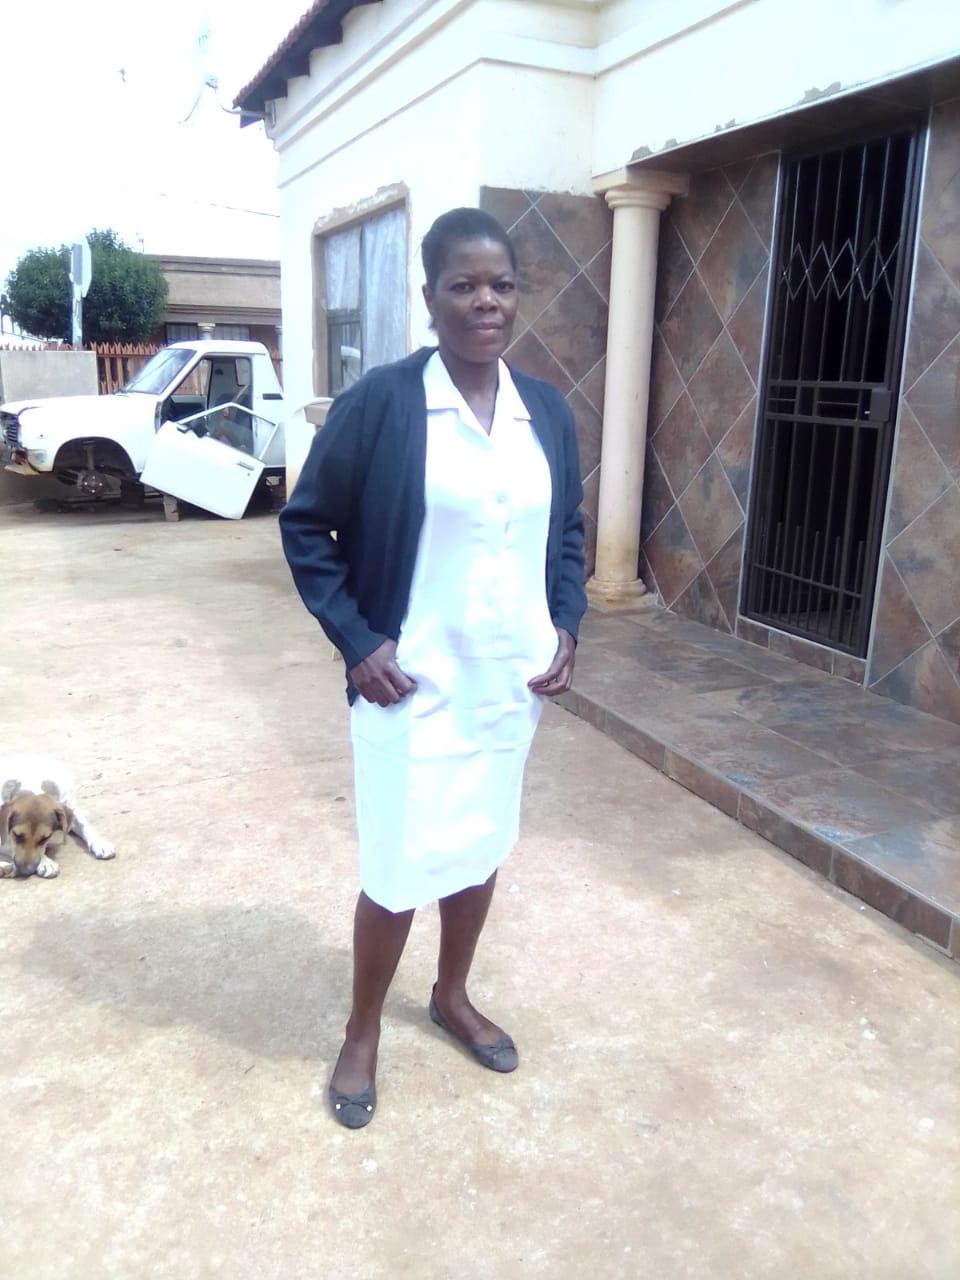 ZIMBABWEAN DOMESTIC WORKER /NANNY